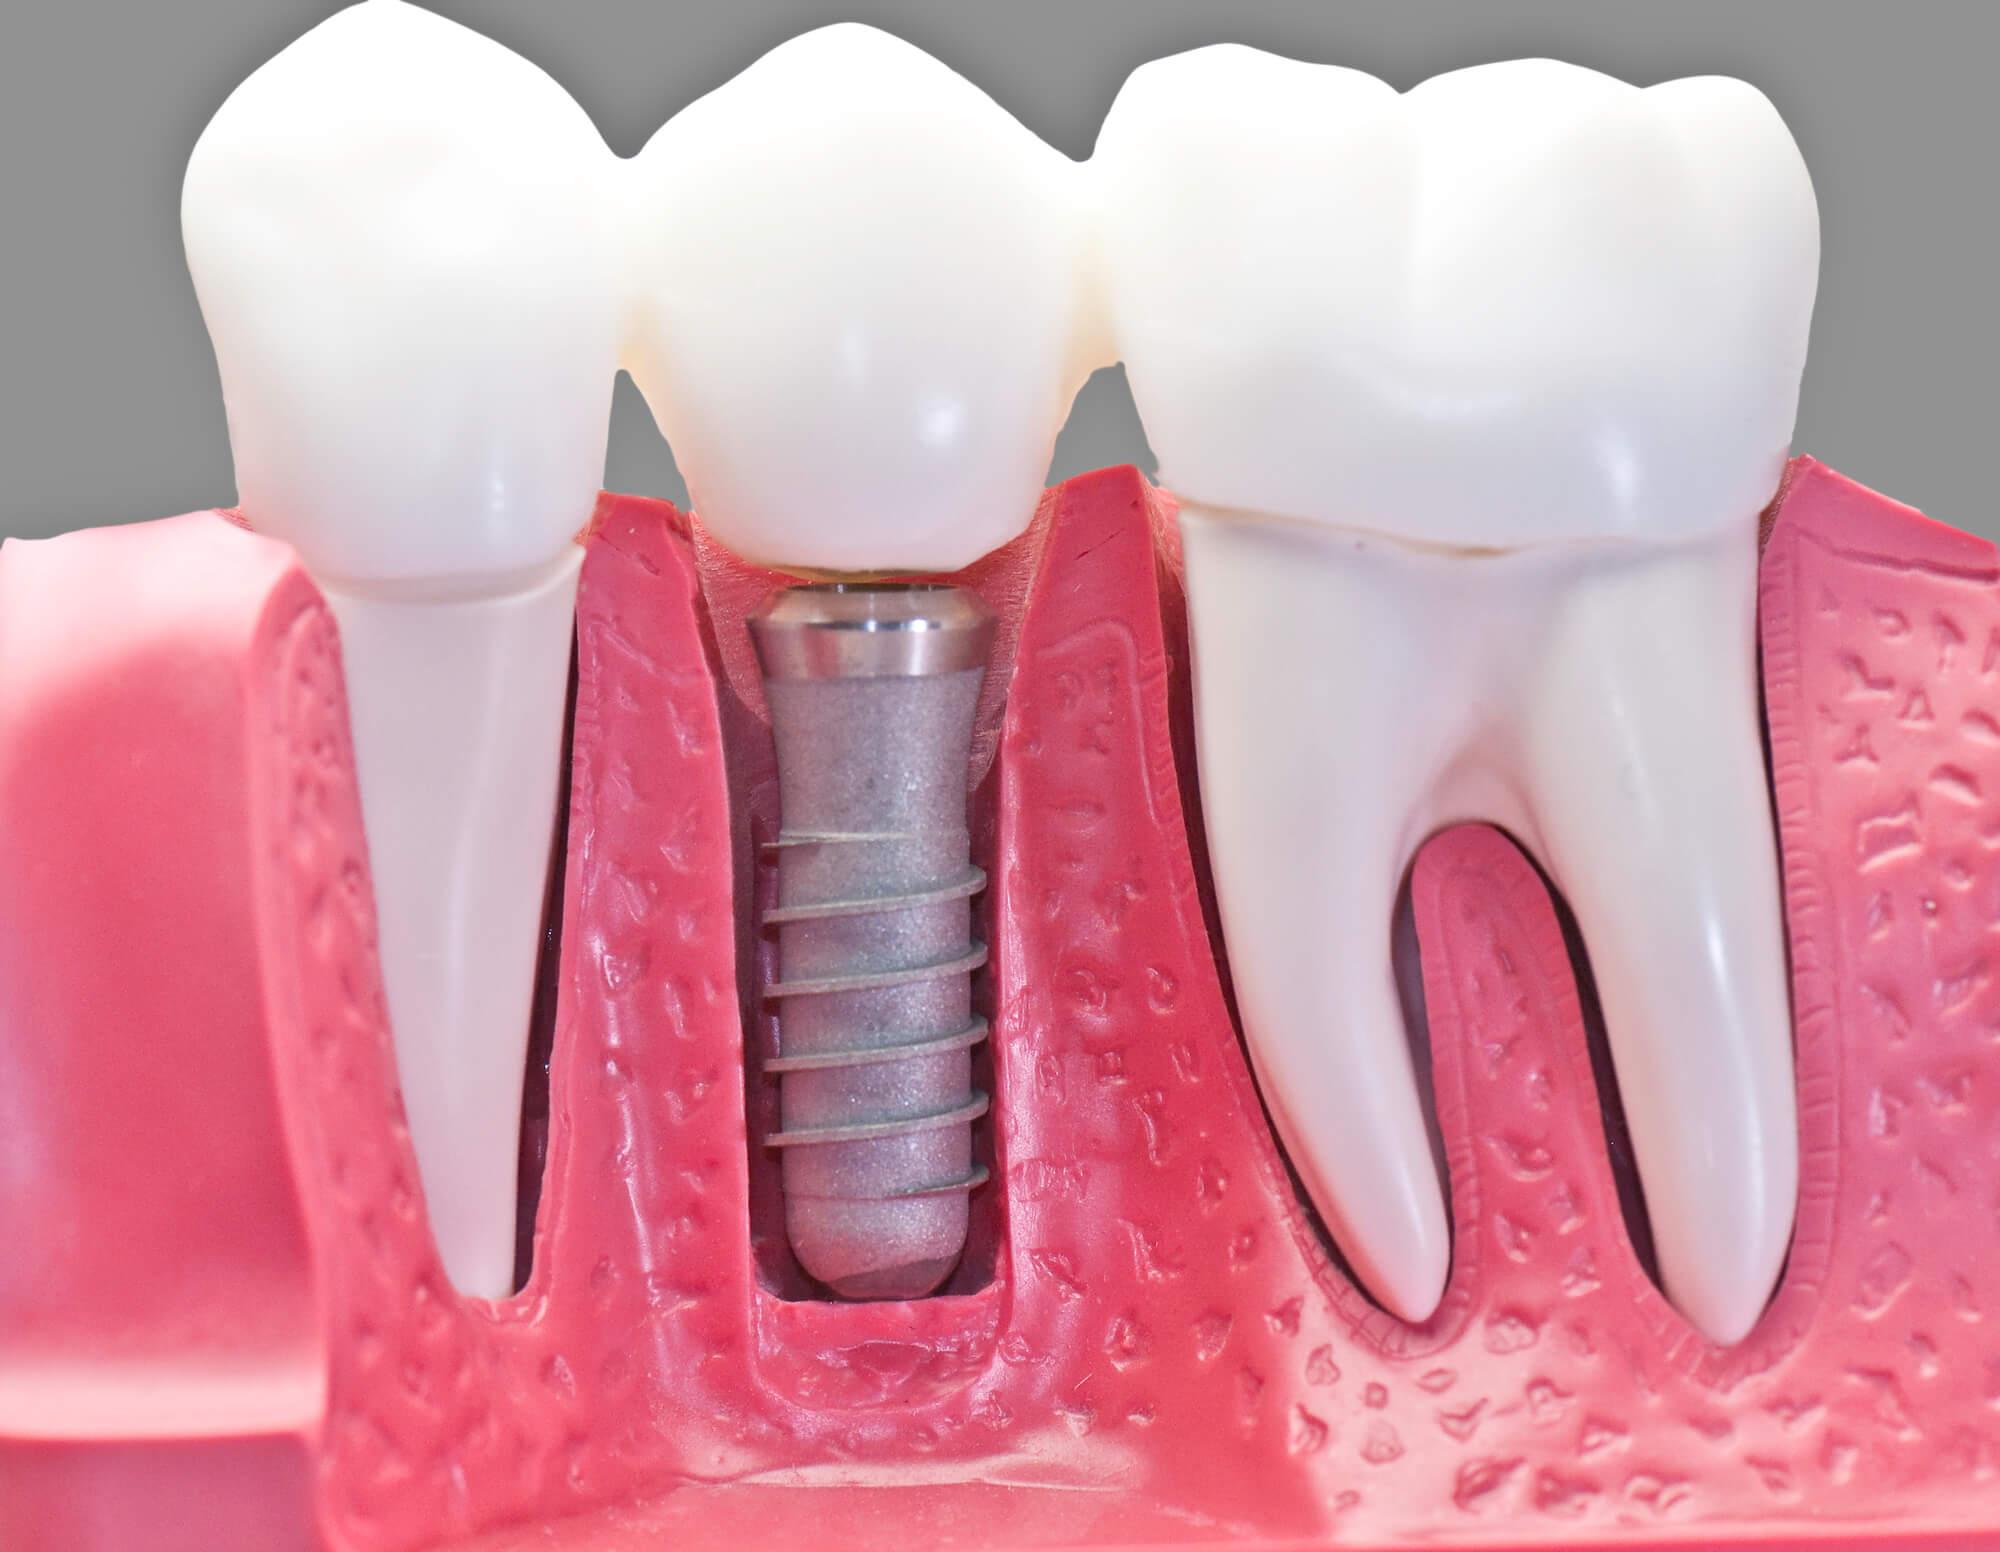 Dental Implants North Charleston SC